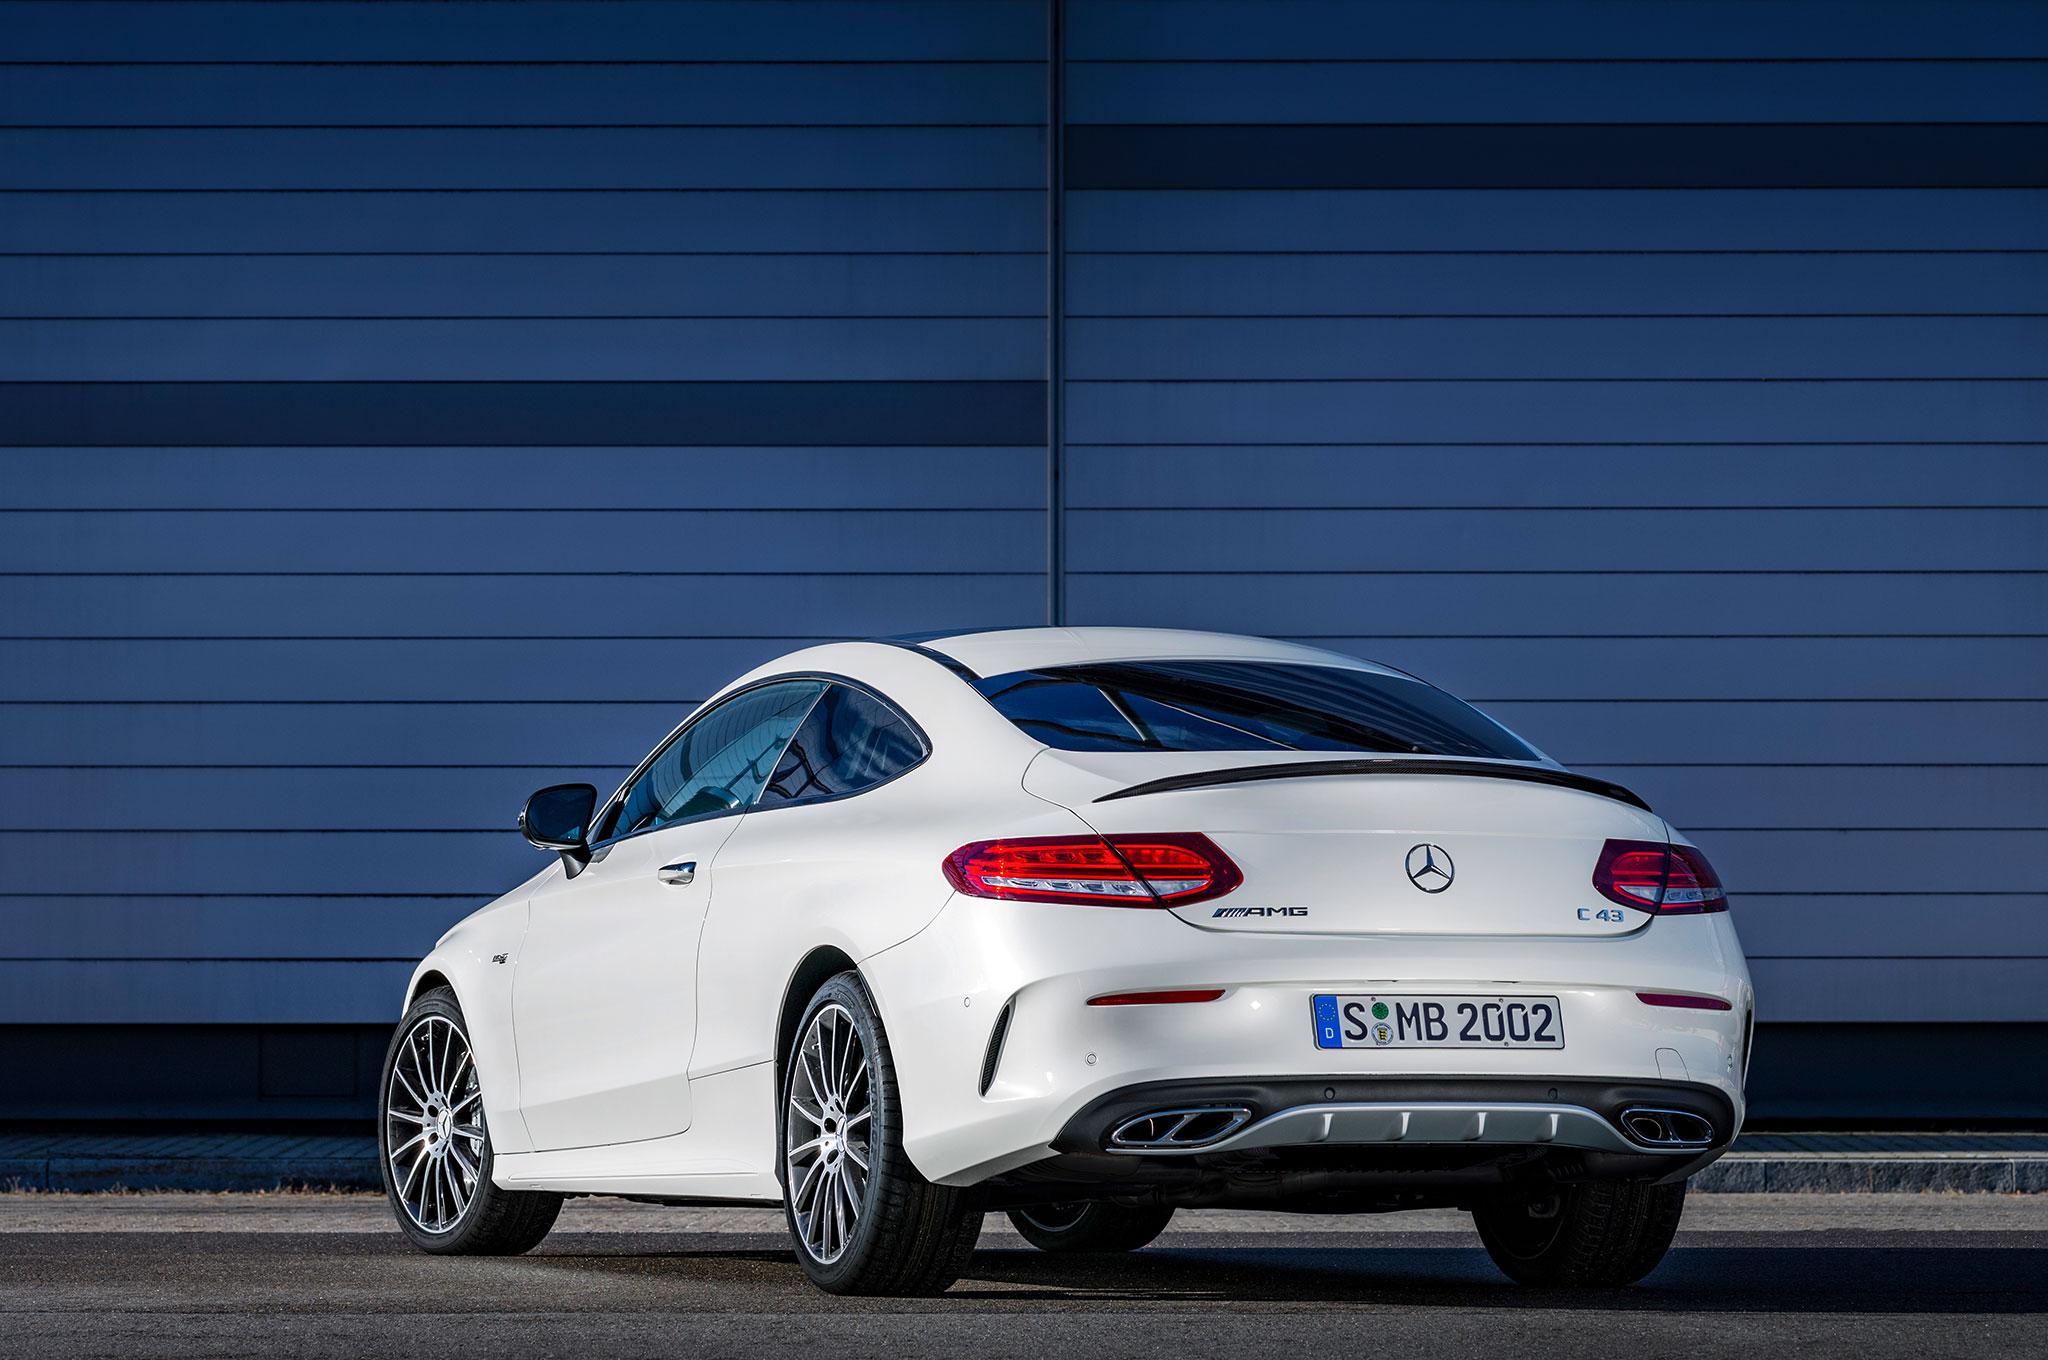 http://st.automobilemag.com/uploads/sites/11/2016/02/2017-Mercedes-AMG-C43-Coupe-rear-three-quarter.jpg